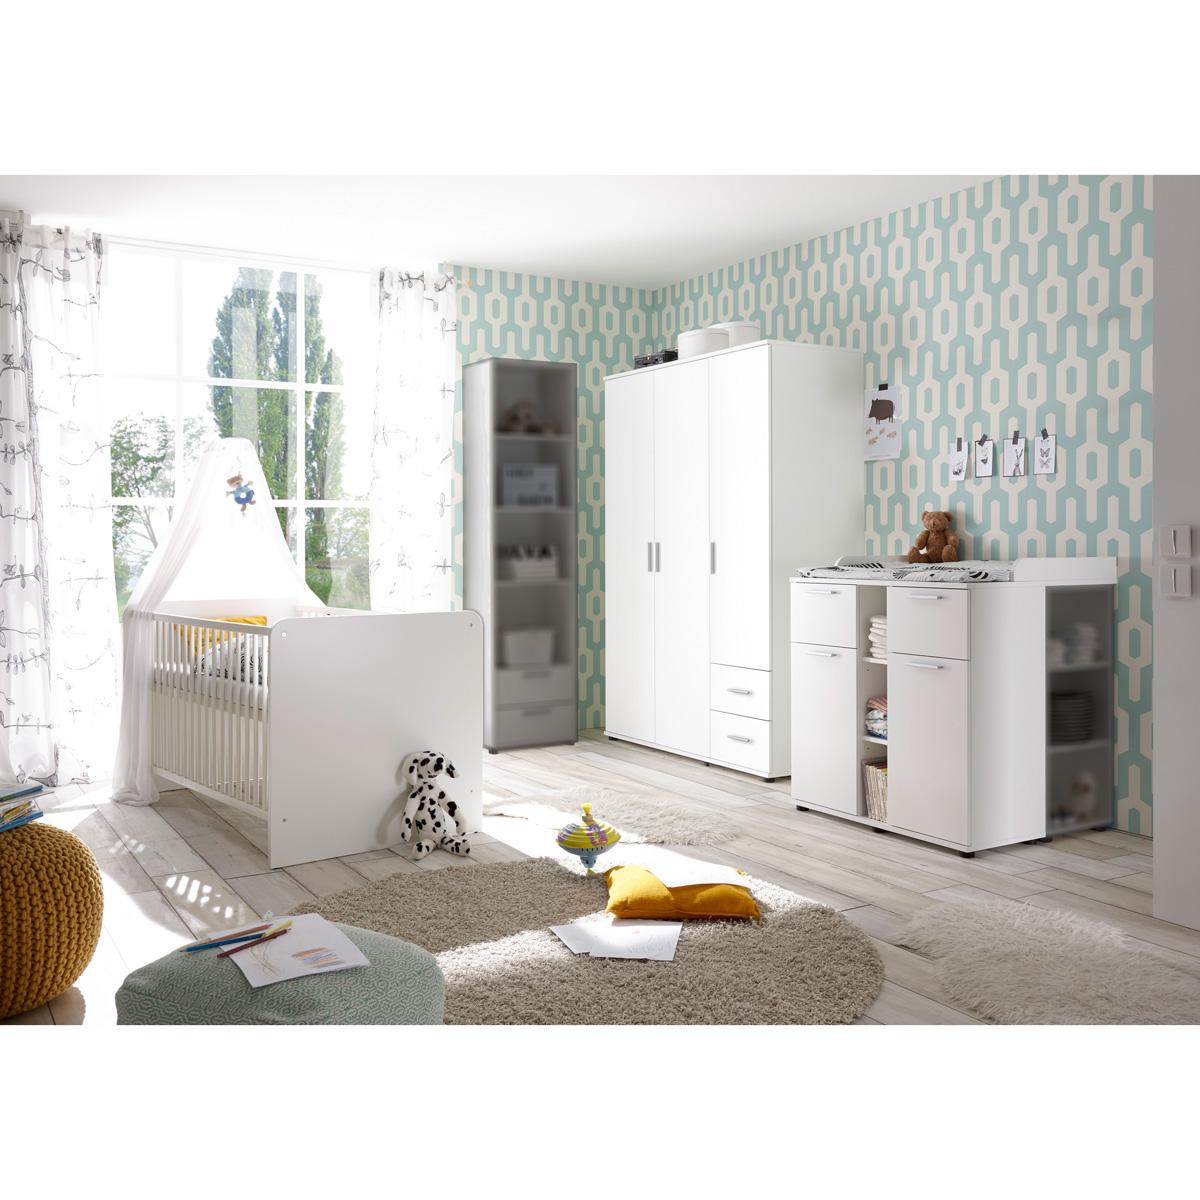 babyzimmer bibo kinderzimmer set schrank bett kommode regal in wei ebay. Black Bedroom Furniture Sets. Home Design Ideas